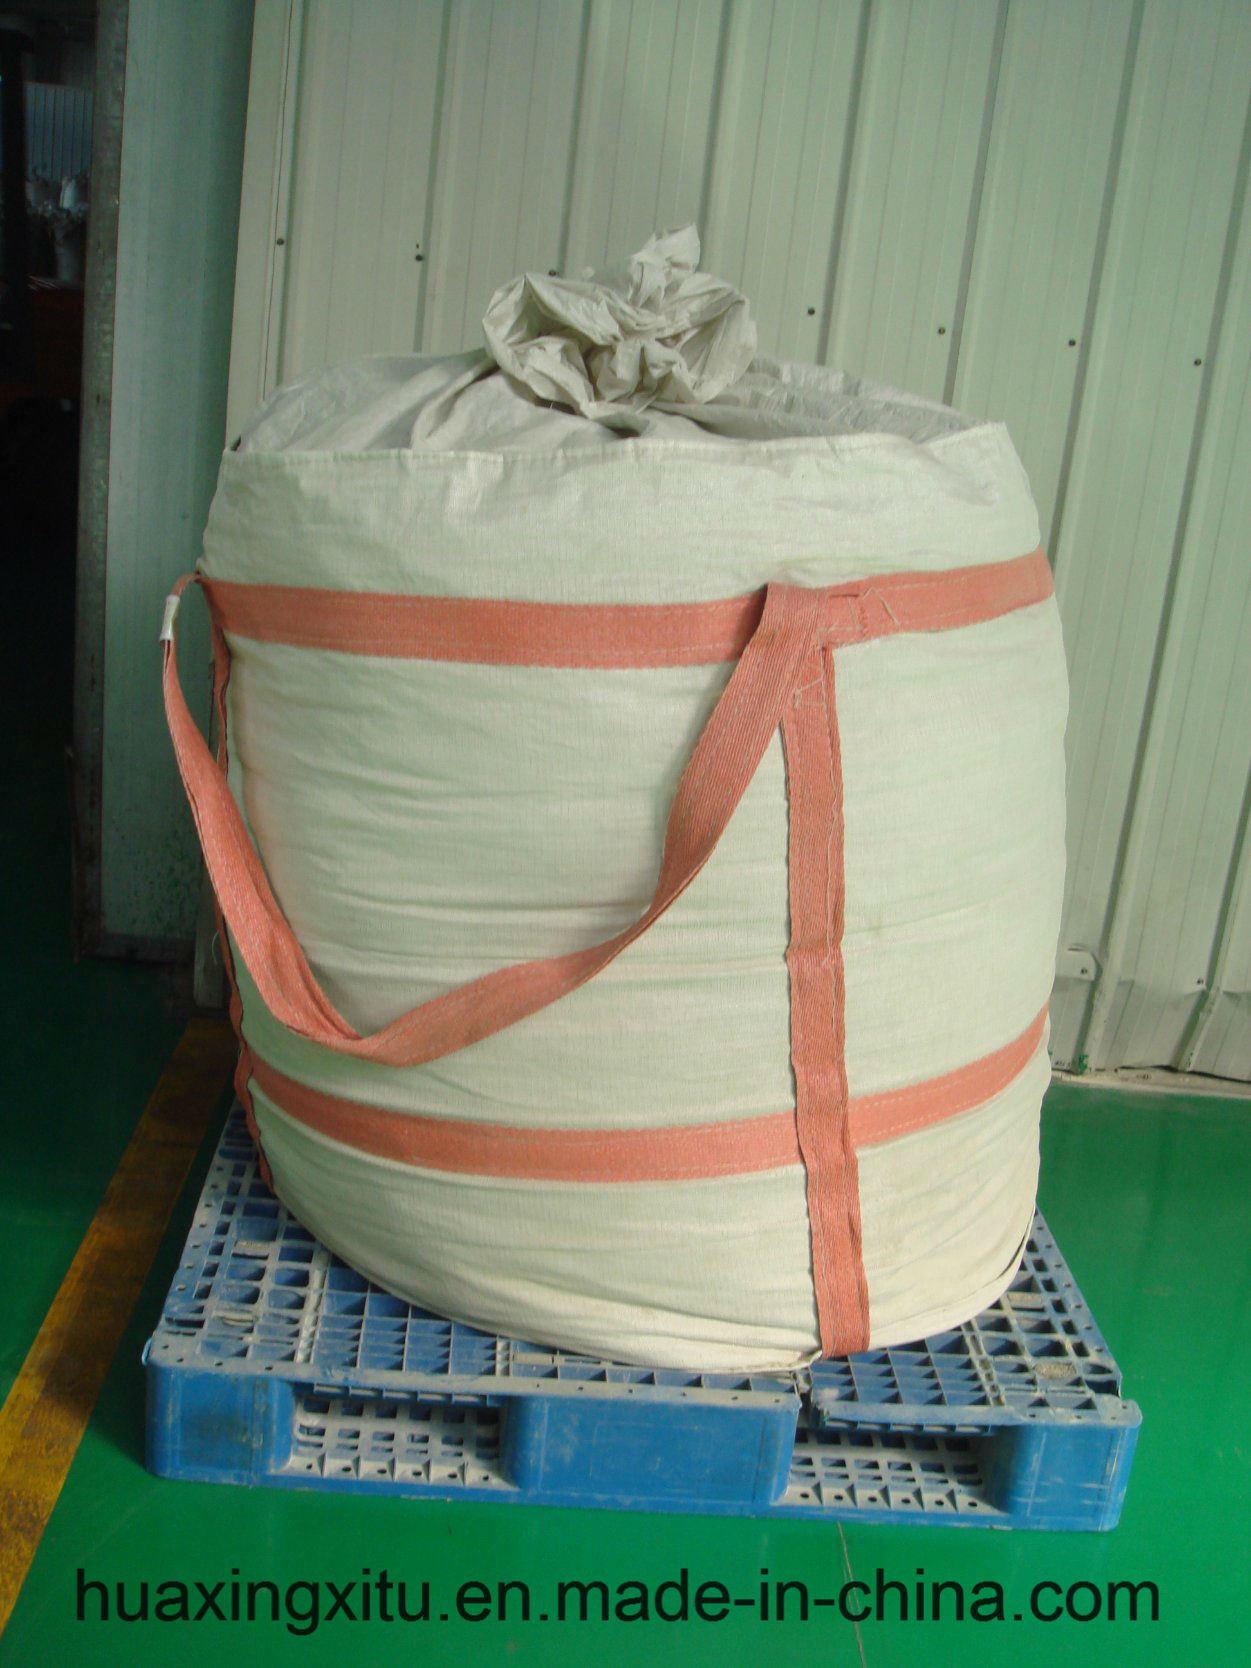 99.95% Purity Rare Earth Cerium Oxide Lanthanum for Flat Float Polishing Powder Glass